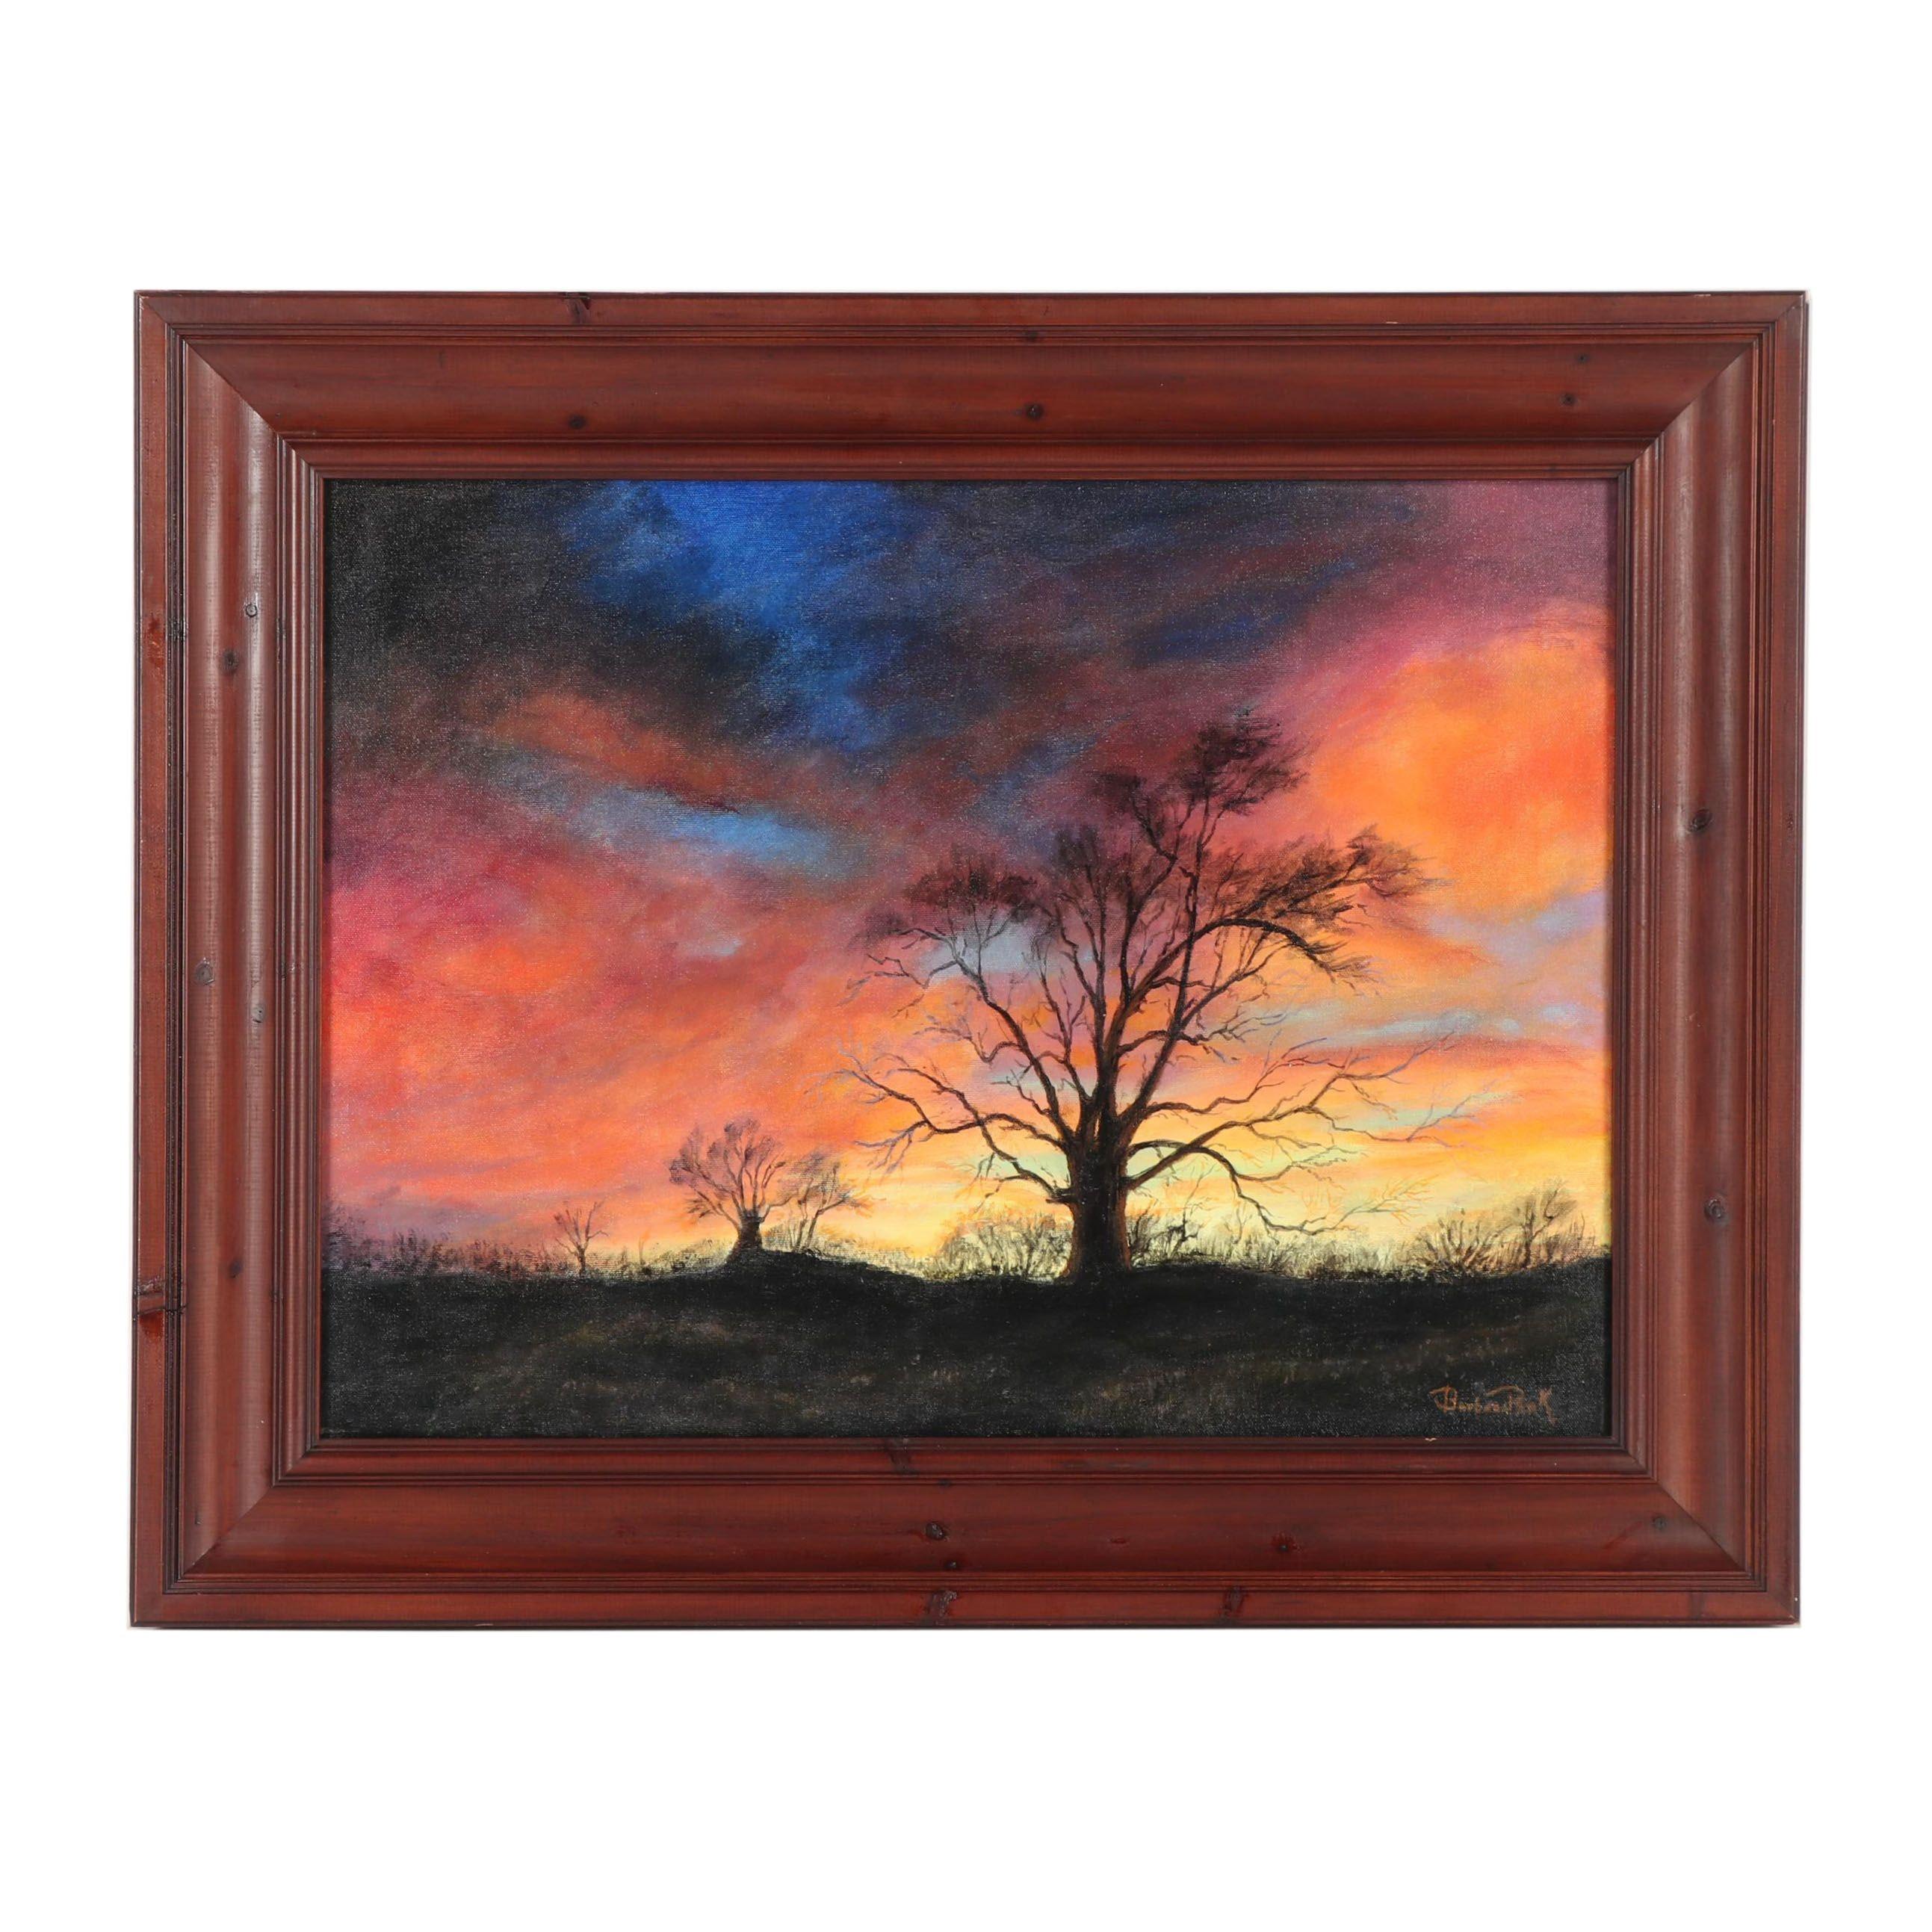 Barbara Park Oil Painting of Tree Silhouette